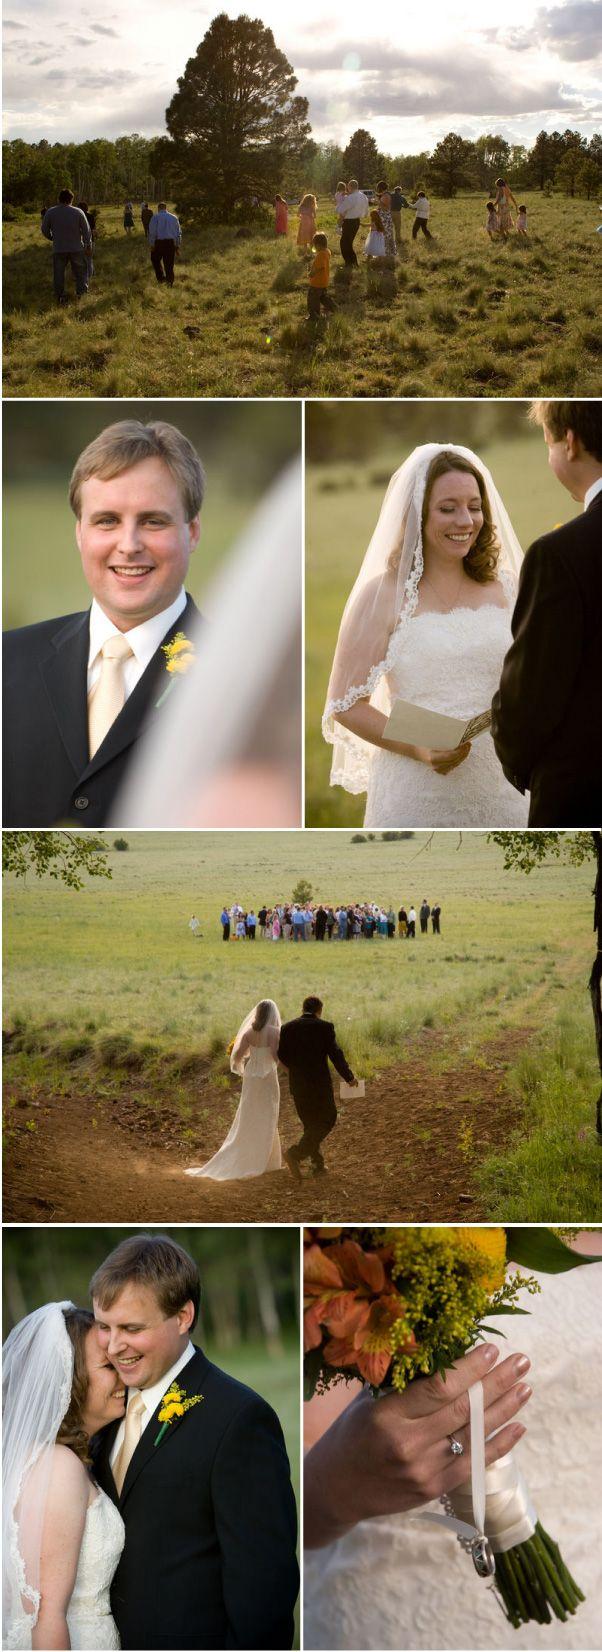 Do it yourself outdoor wedding ideas - - repinned by: http://weddingideas.siterubix.com/ #seemoreweddingideas